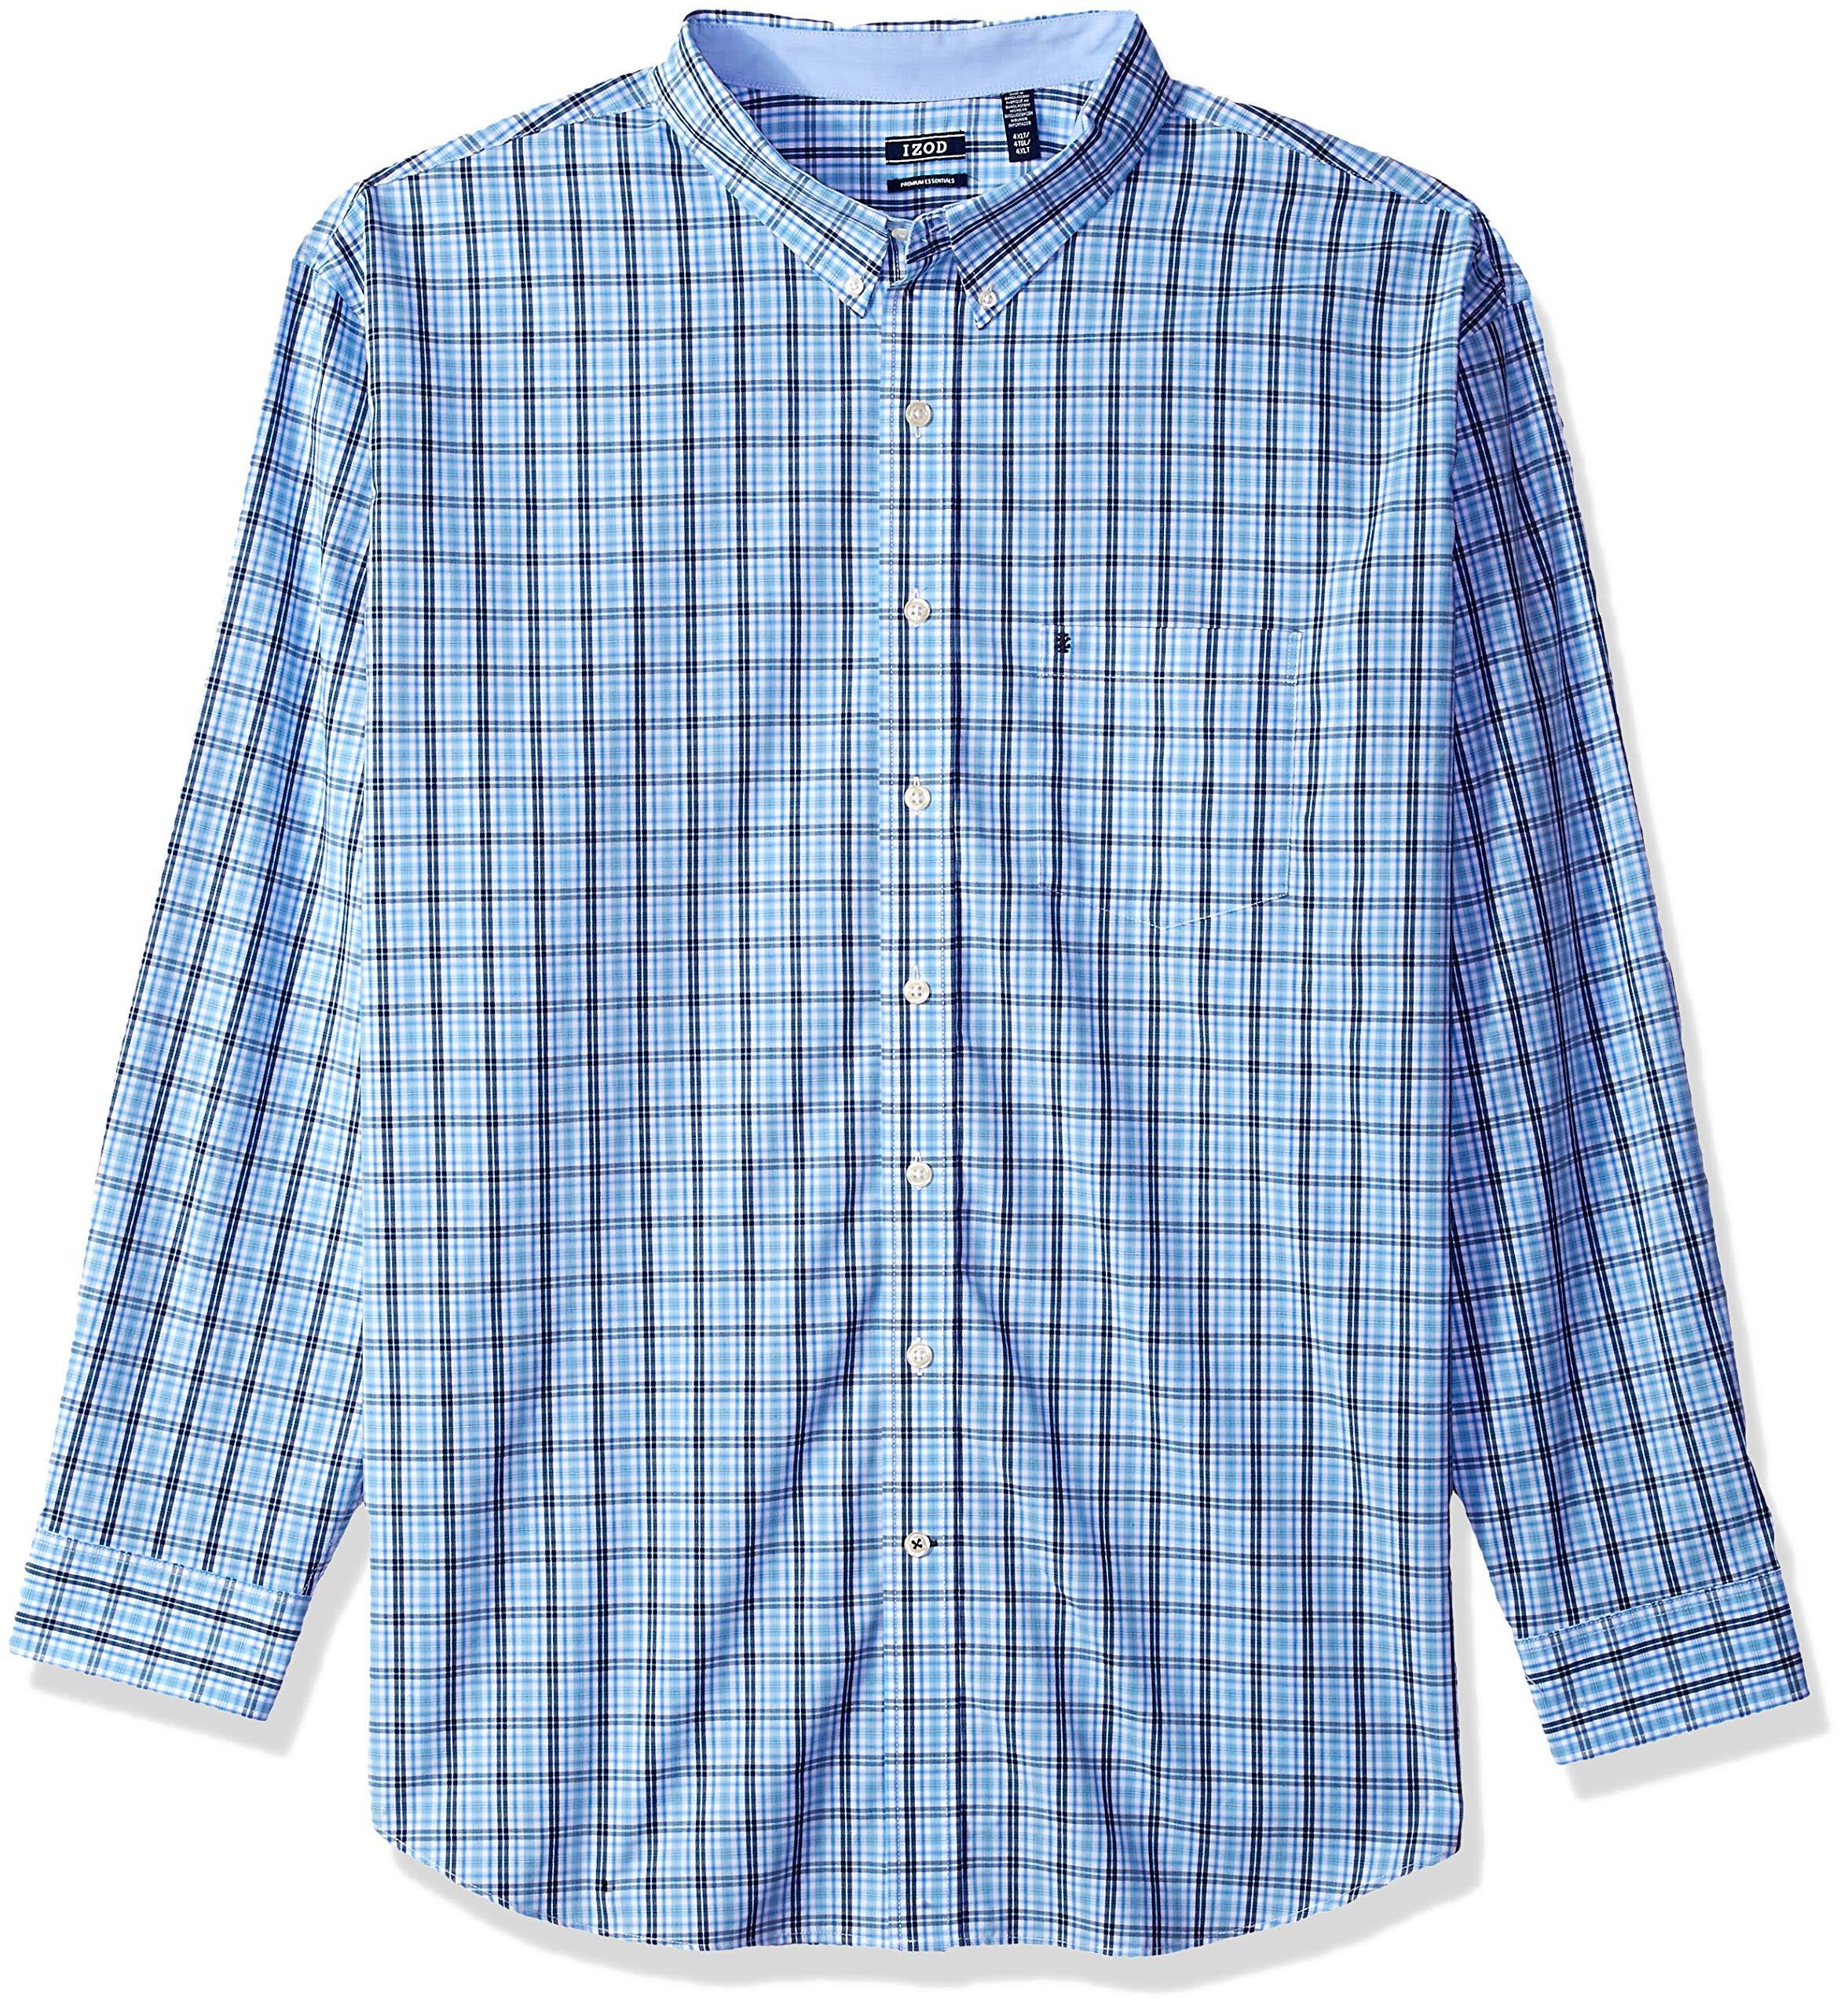 By Ltl Mit Izod Blue Lt Essentials Big Langarmhemd Tall Herren Knopfleiste Premium amp; Stretch wqF8fPvwB